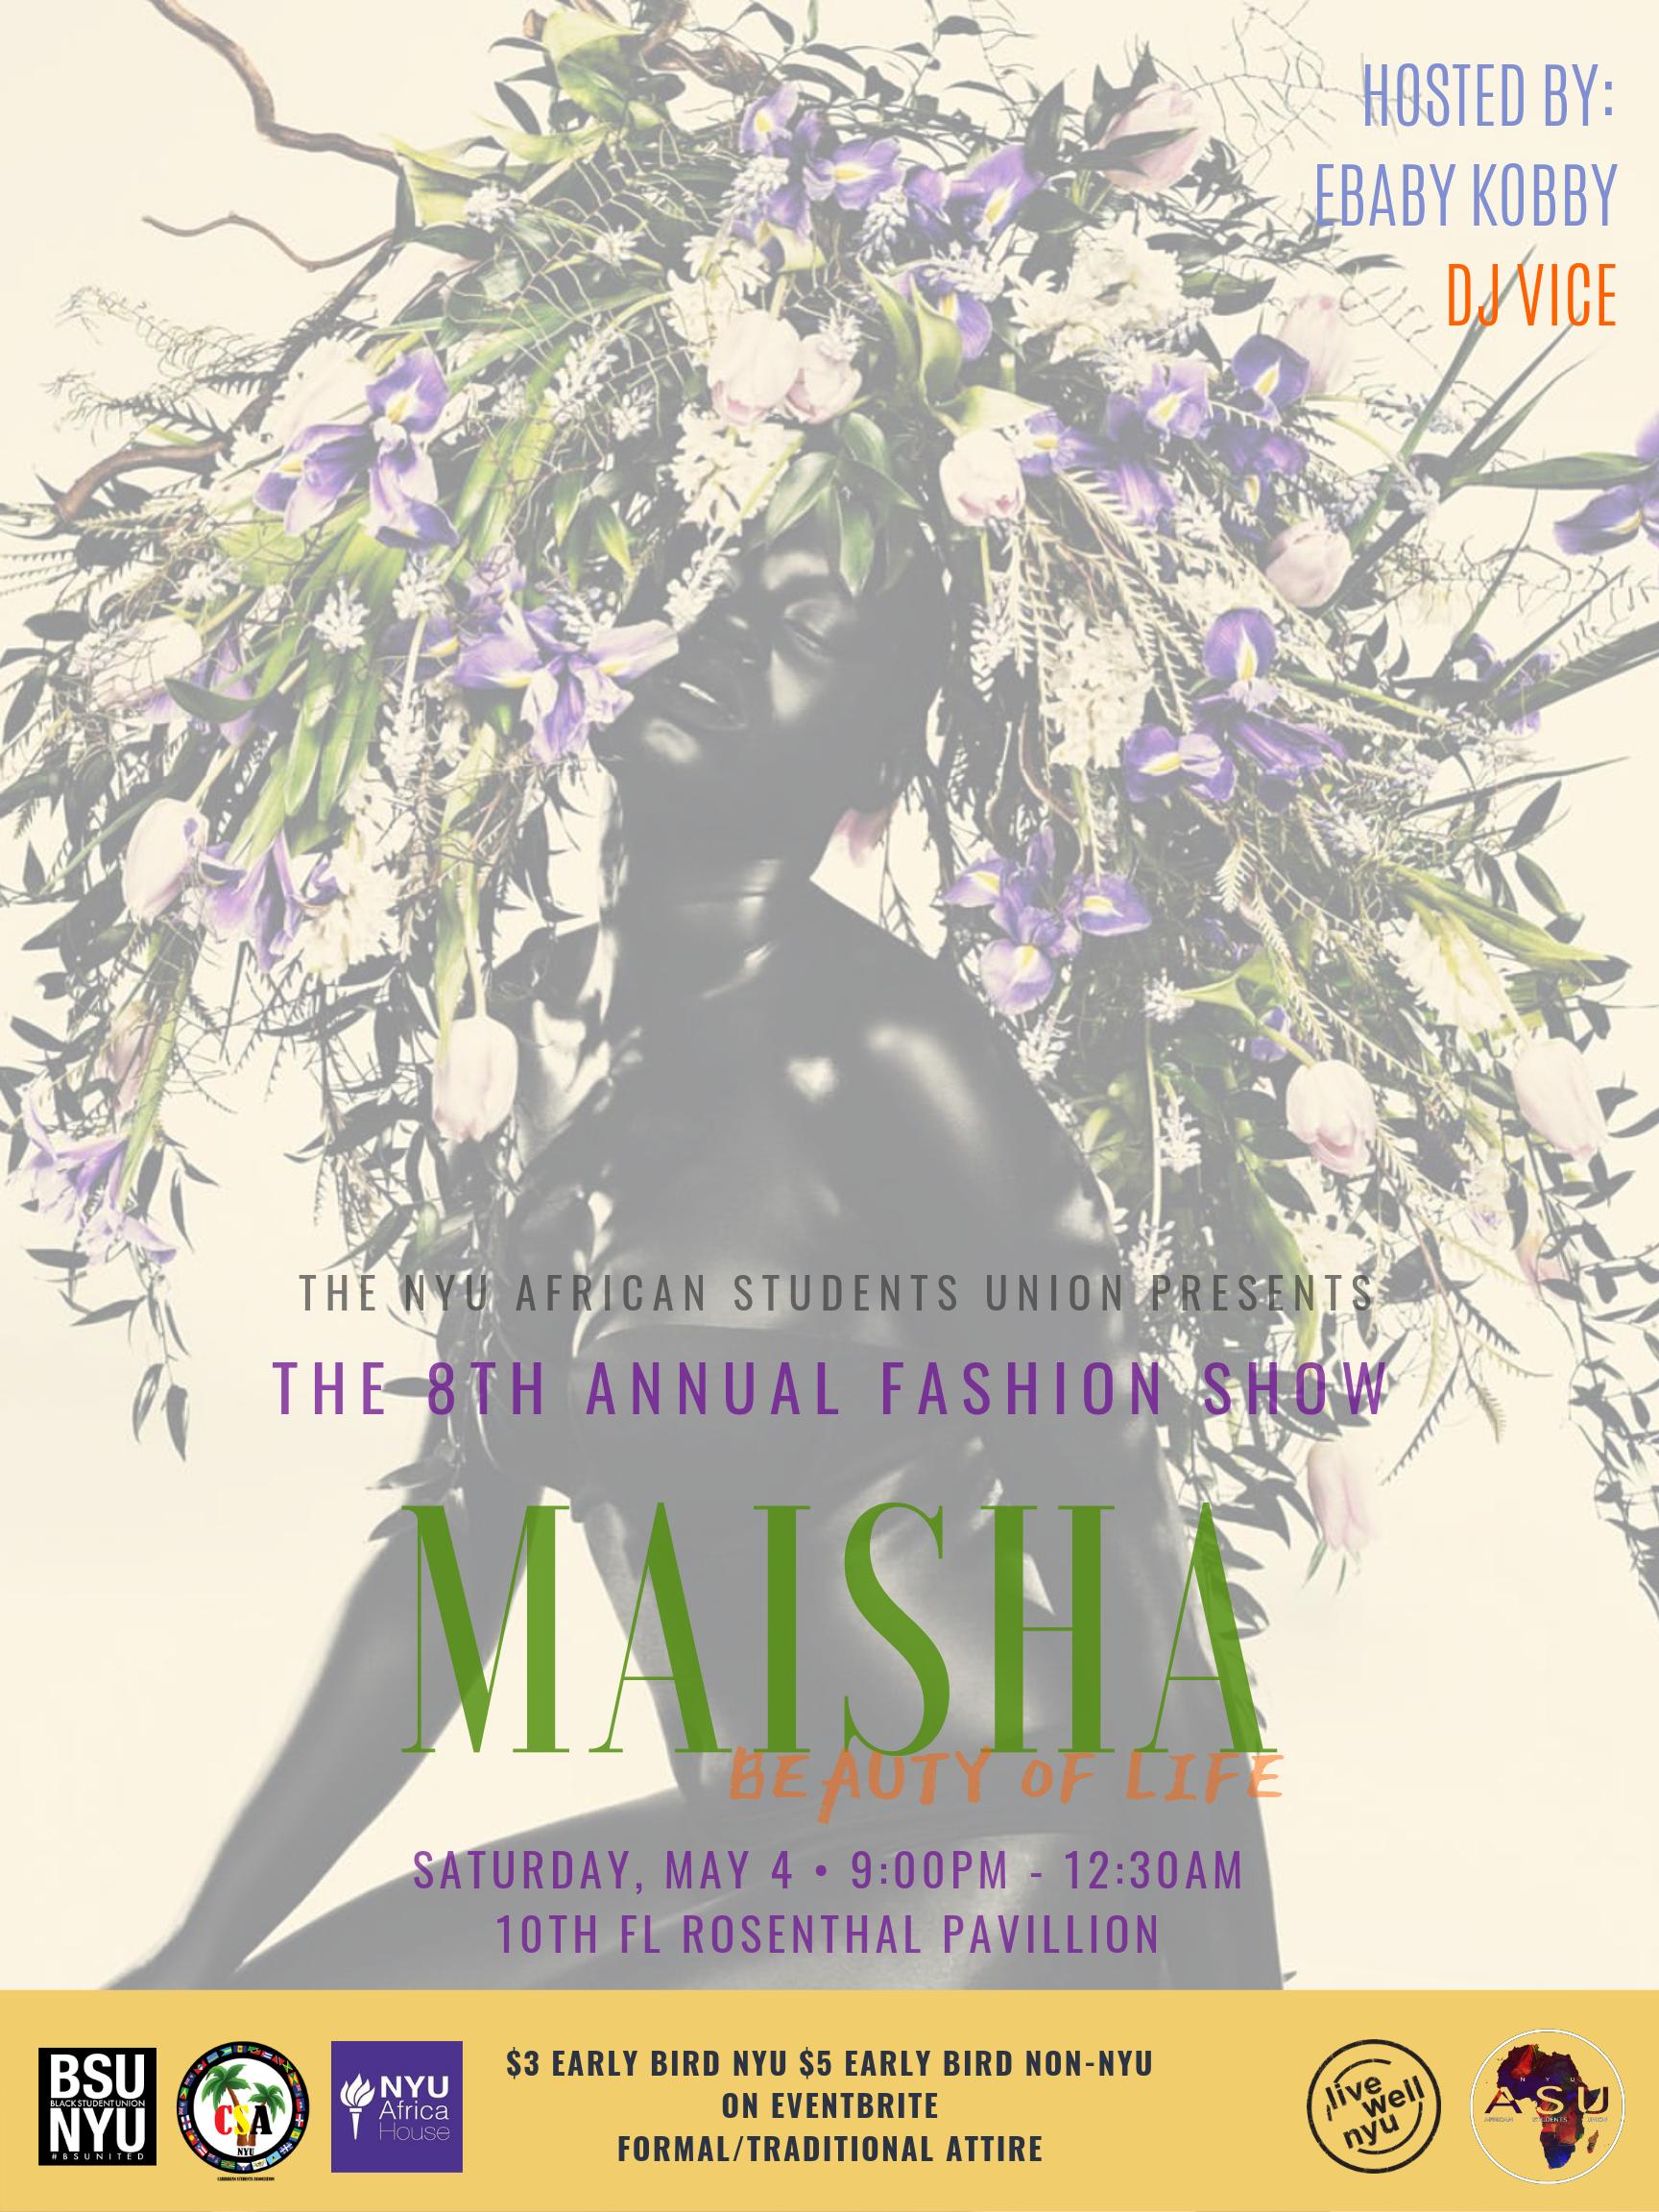 Maisha-Fashion-Show-Flyer.png